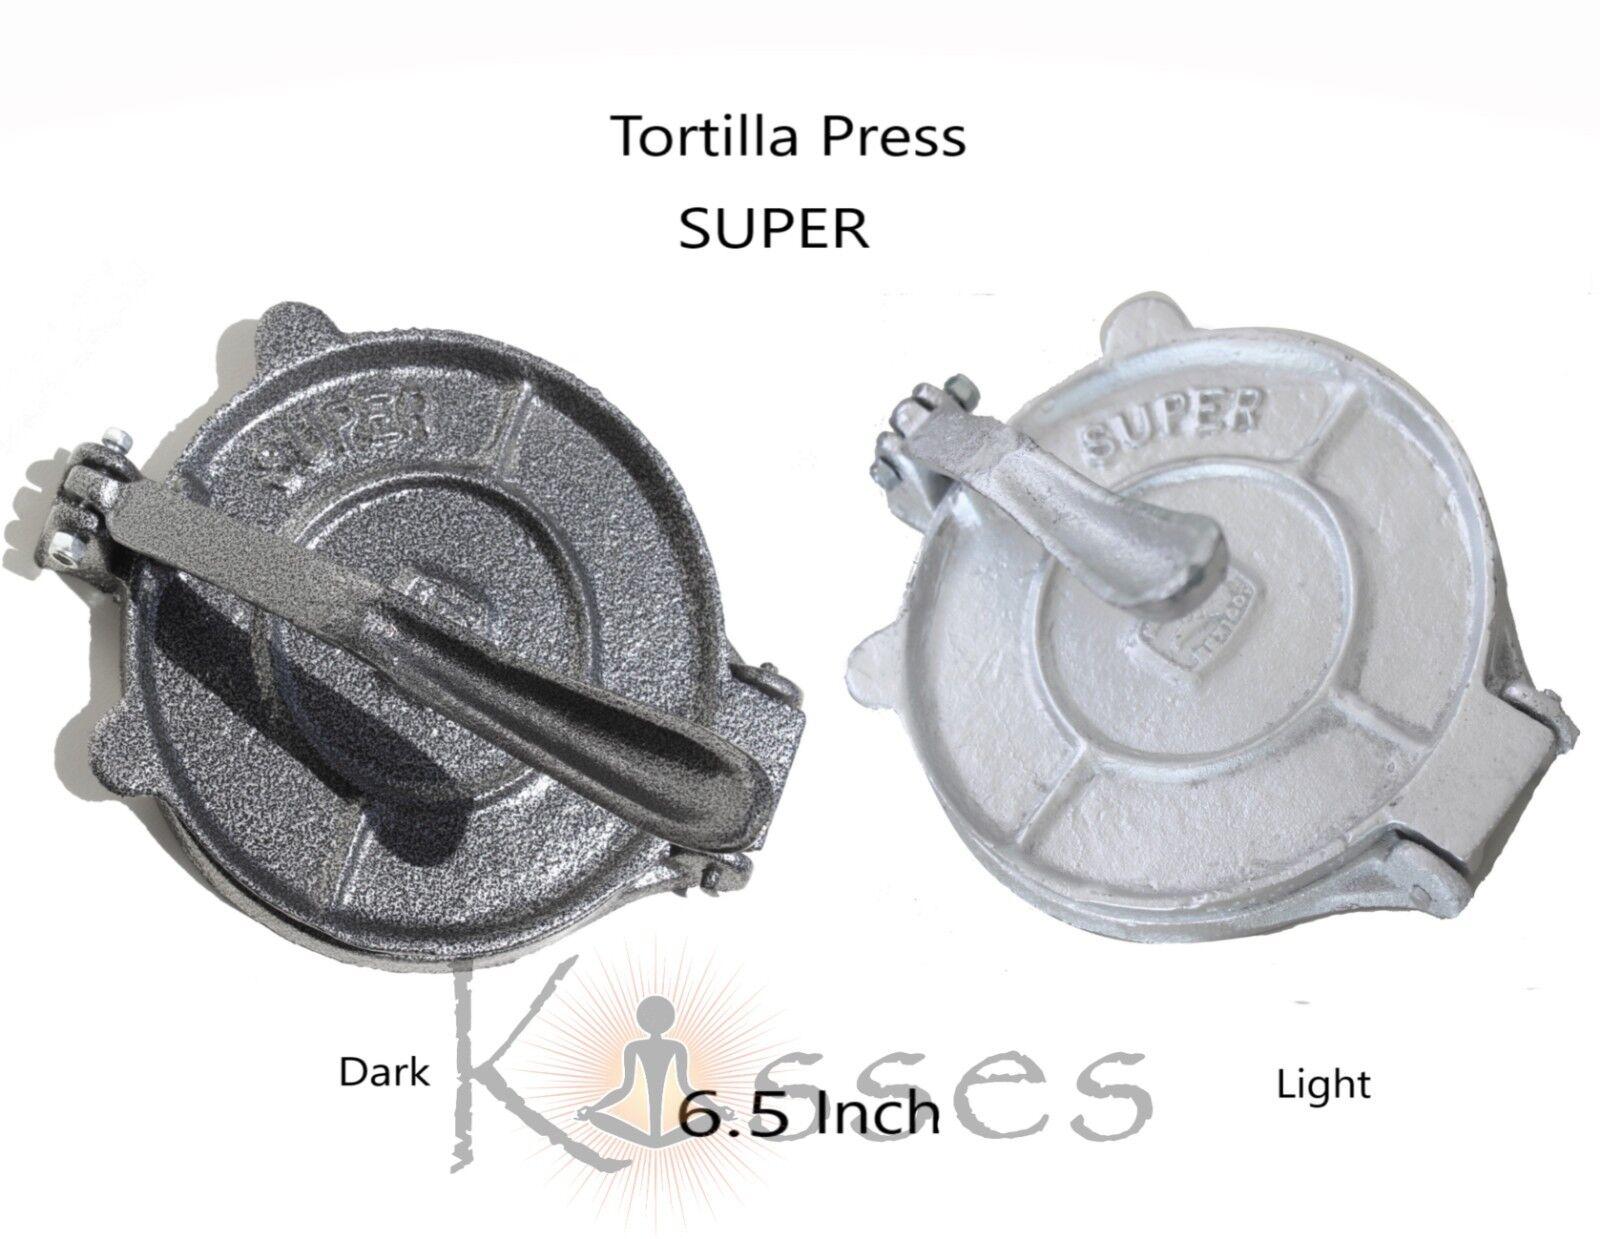 "Nouveau MEXICO fonte Tortilla Press maïs Tortillas tortilladora 6.5/"" pataconera"